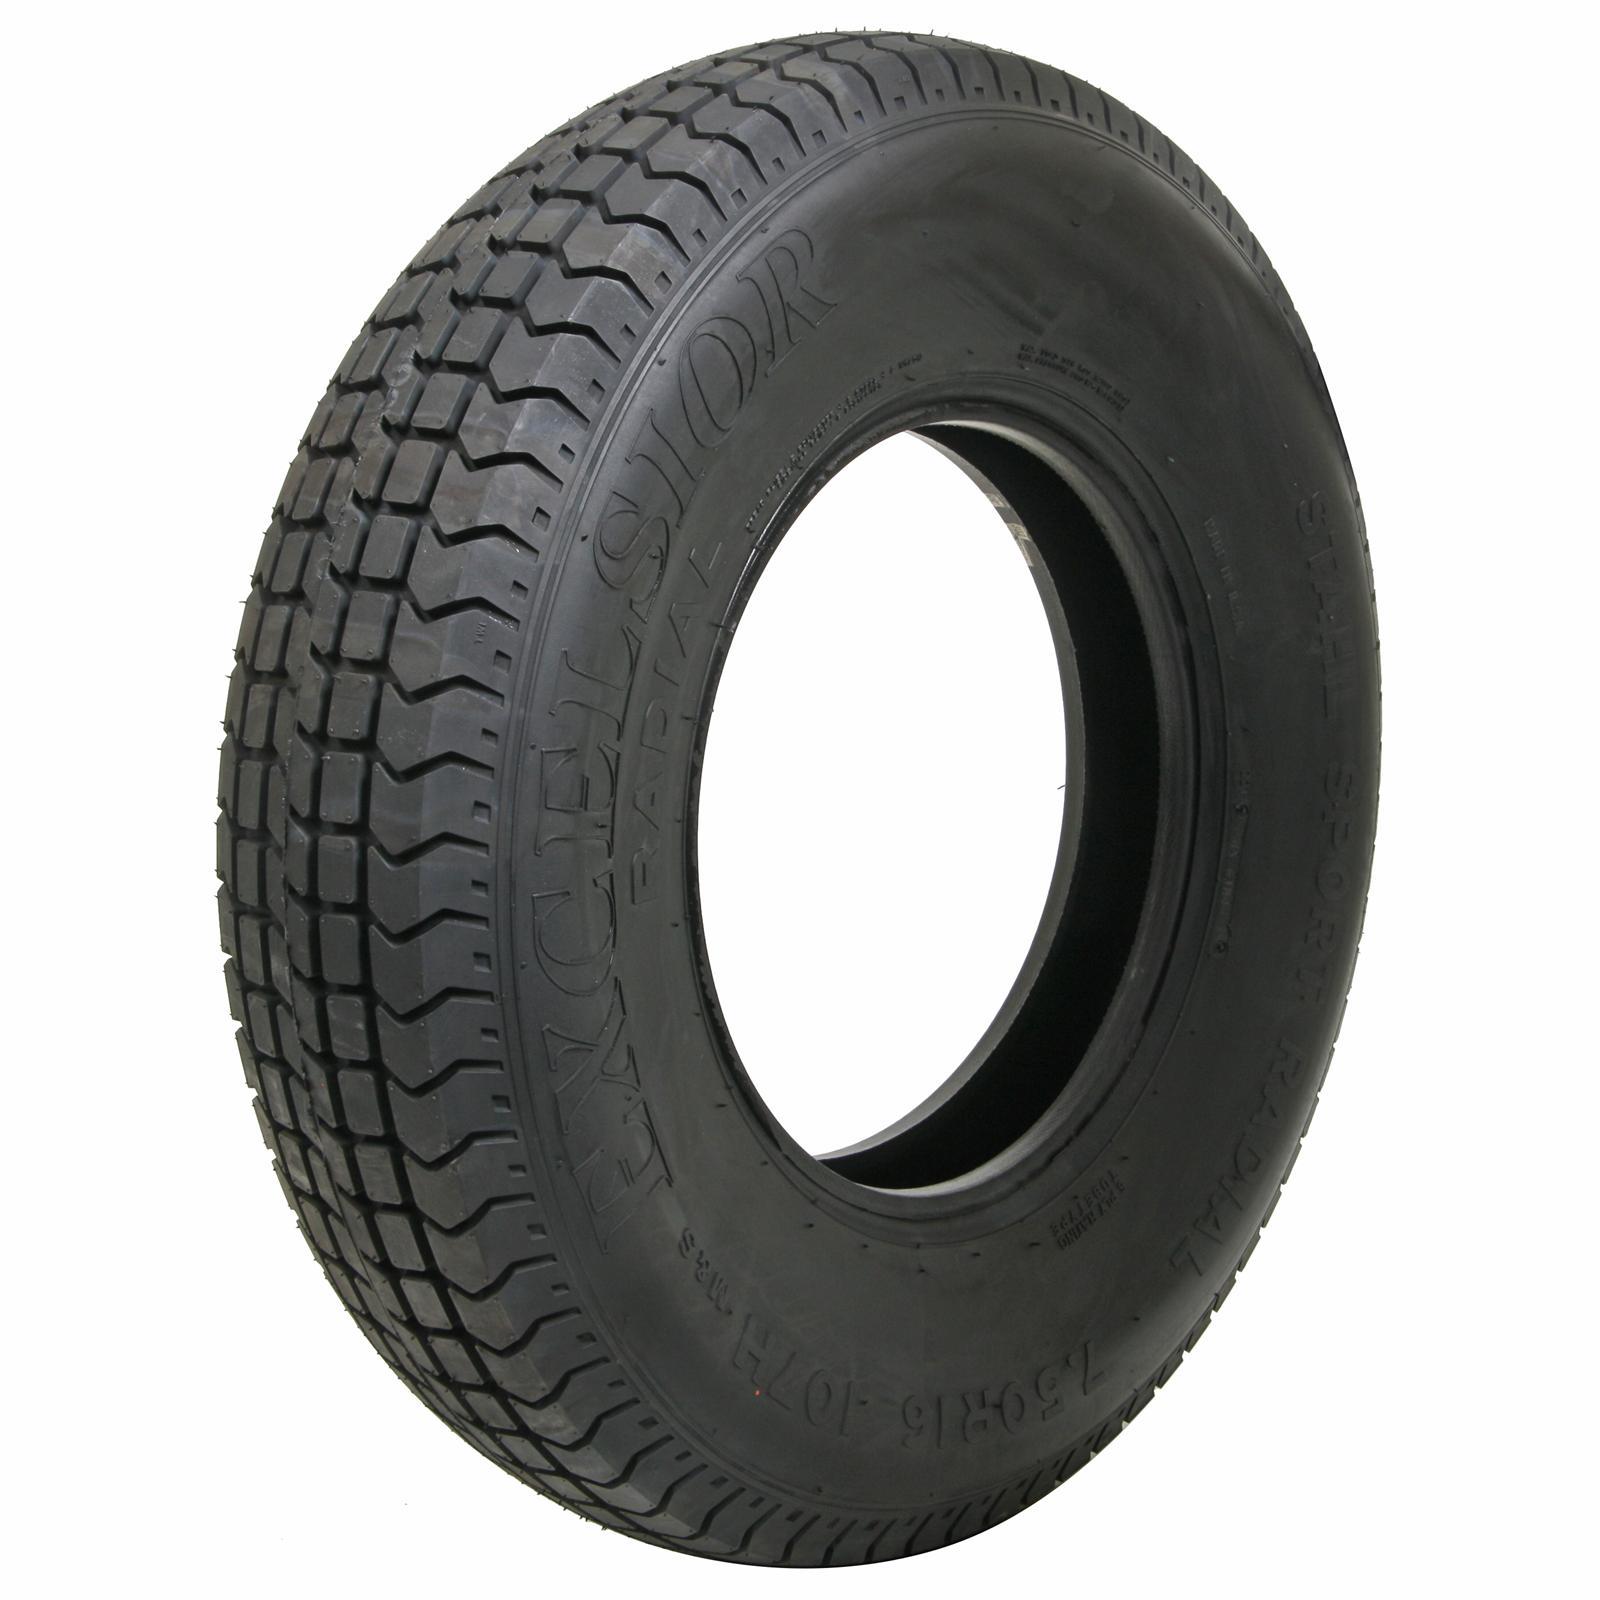 Coker Excelsior Stahl Sport Radial Tires 682297 - Free Shipping on ...